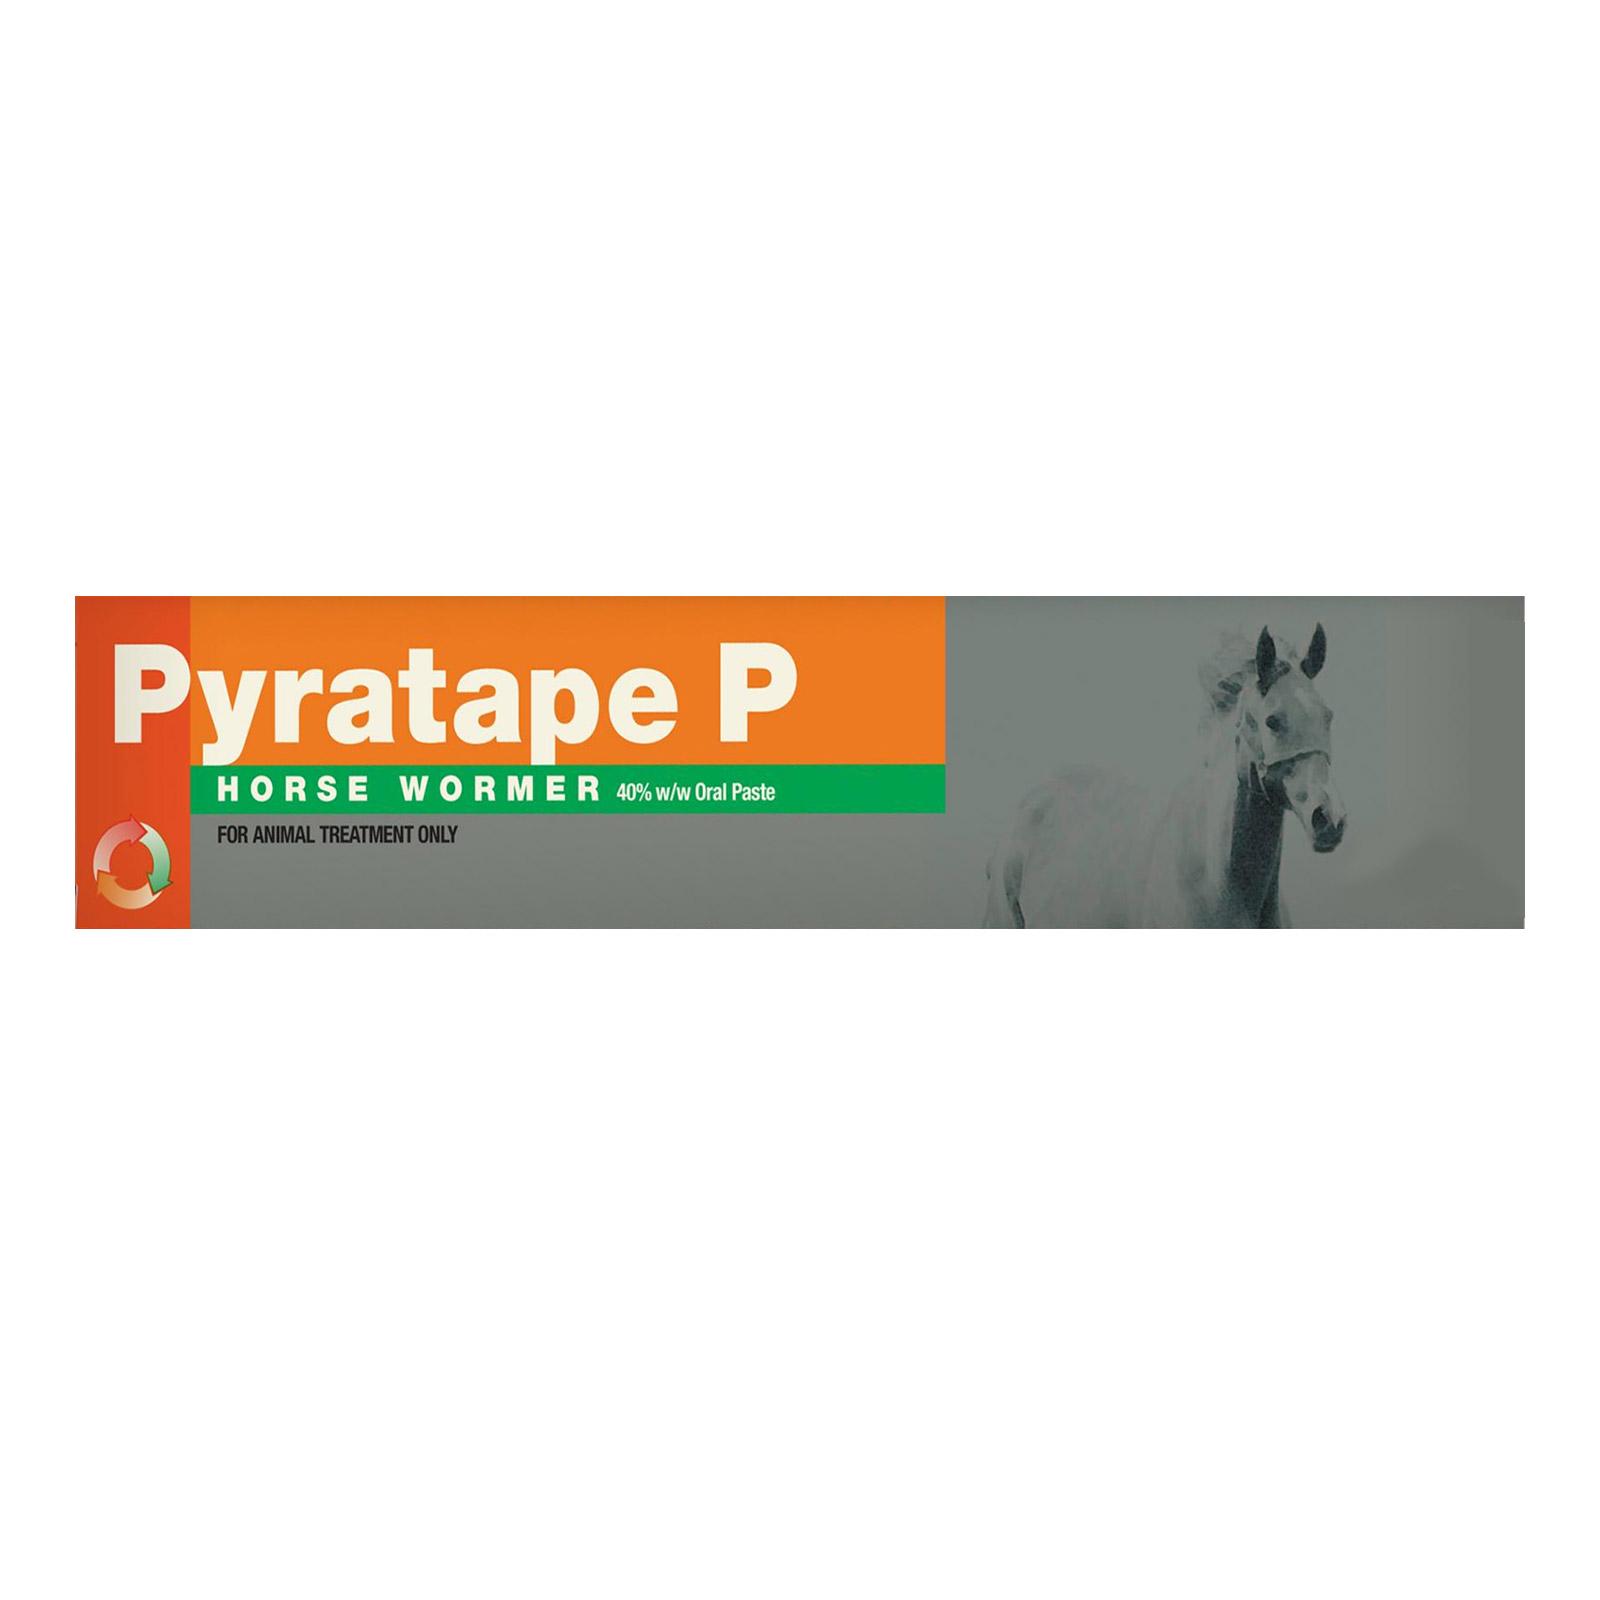 Pyratape P Horse Worming Paste